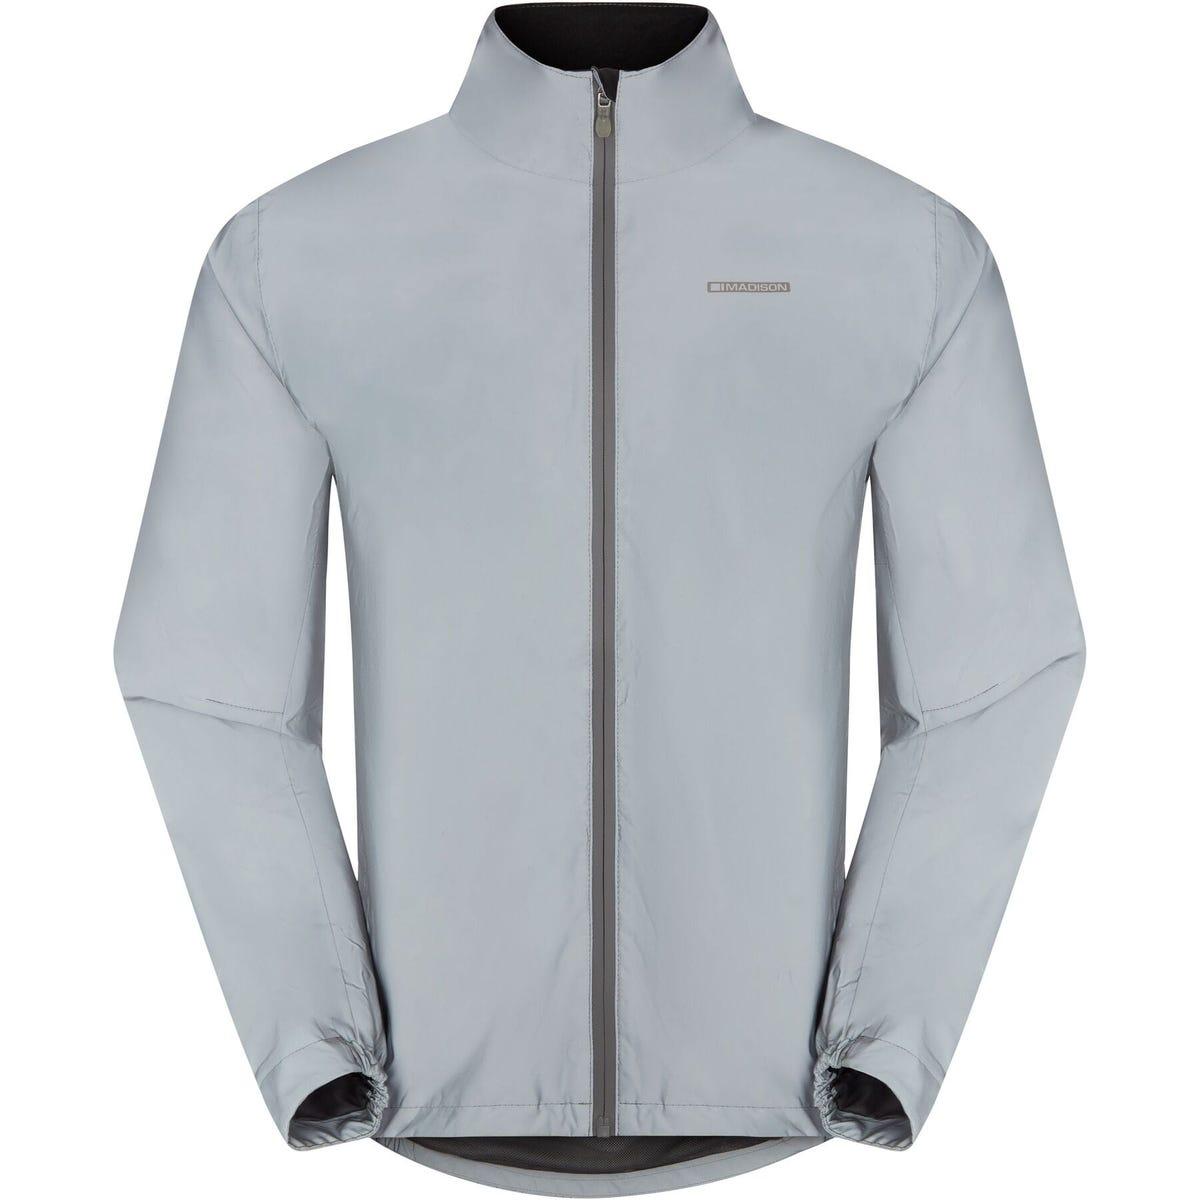 Madison Stellar Shine Reflective men's 2-layer waterproof jacket